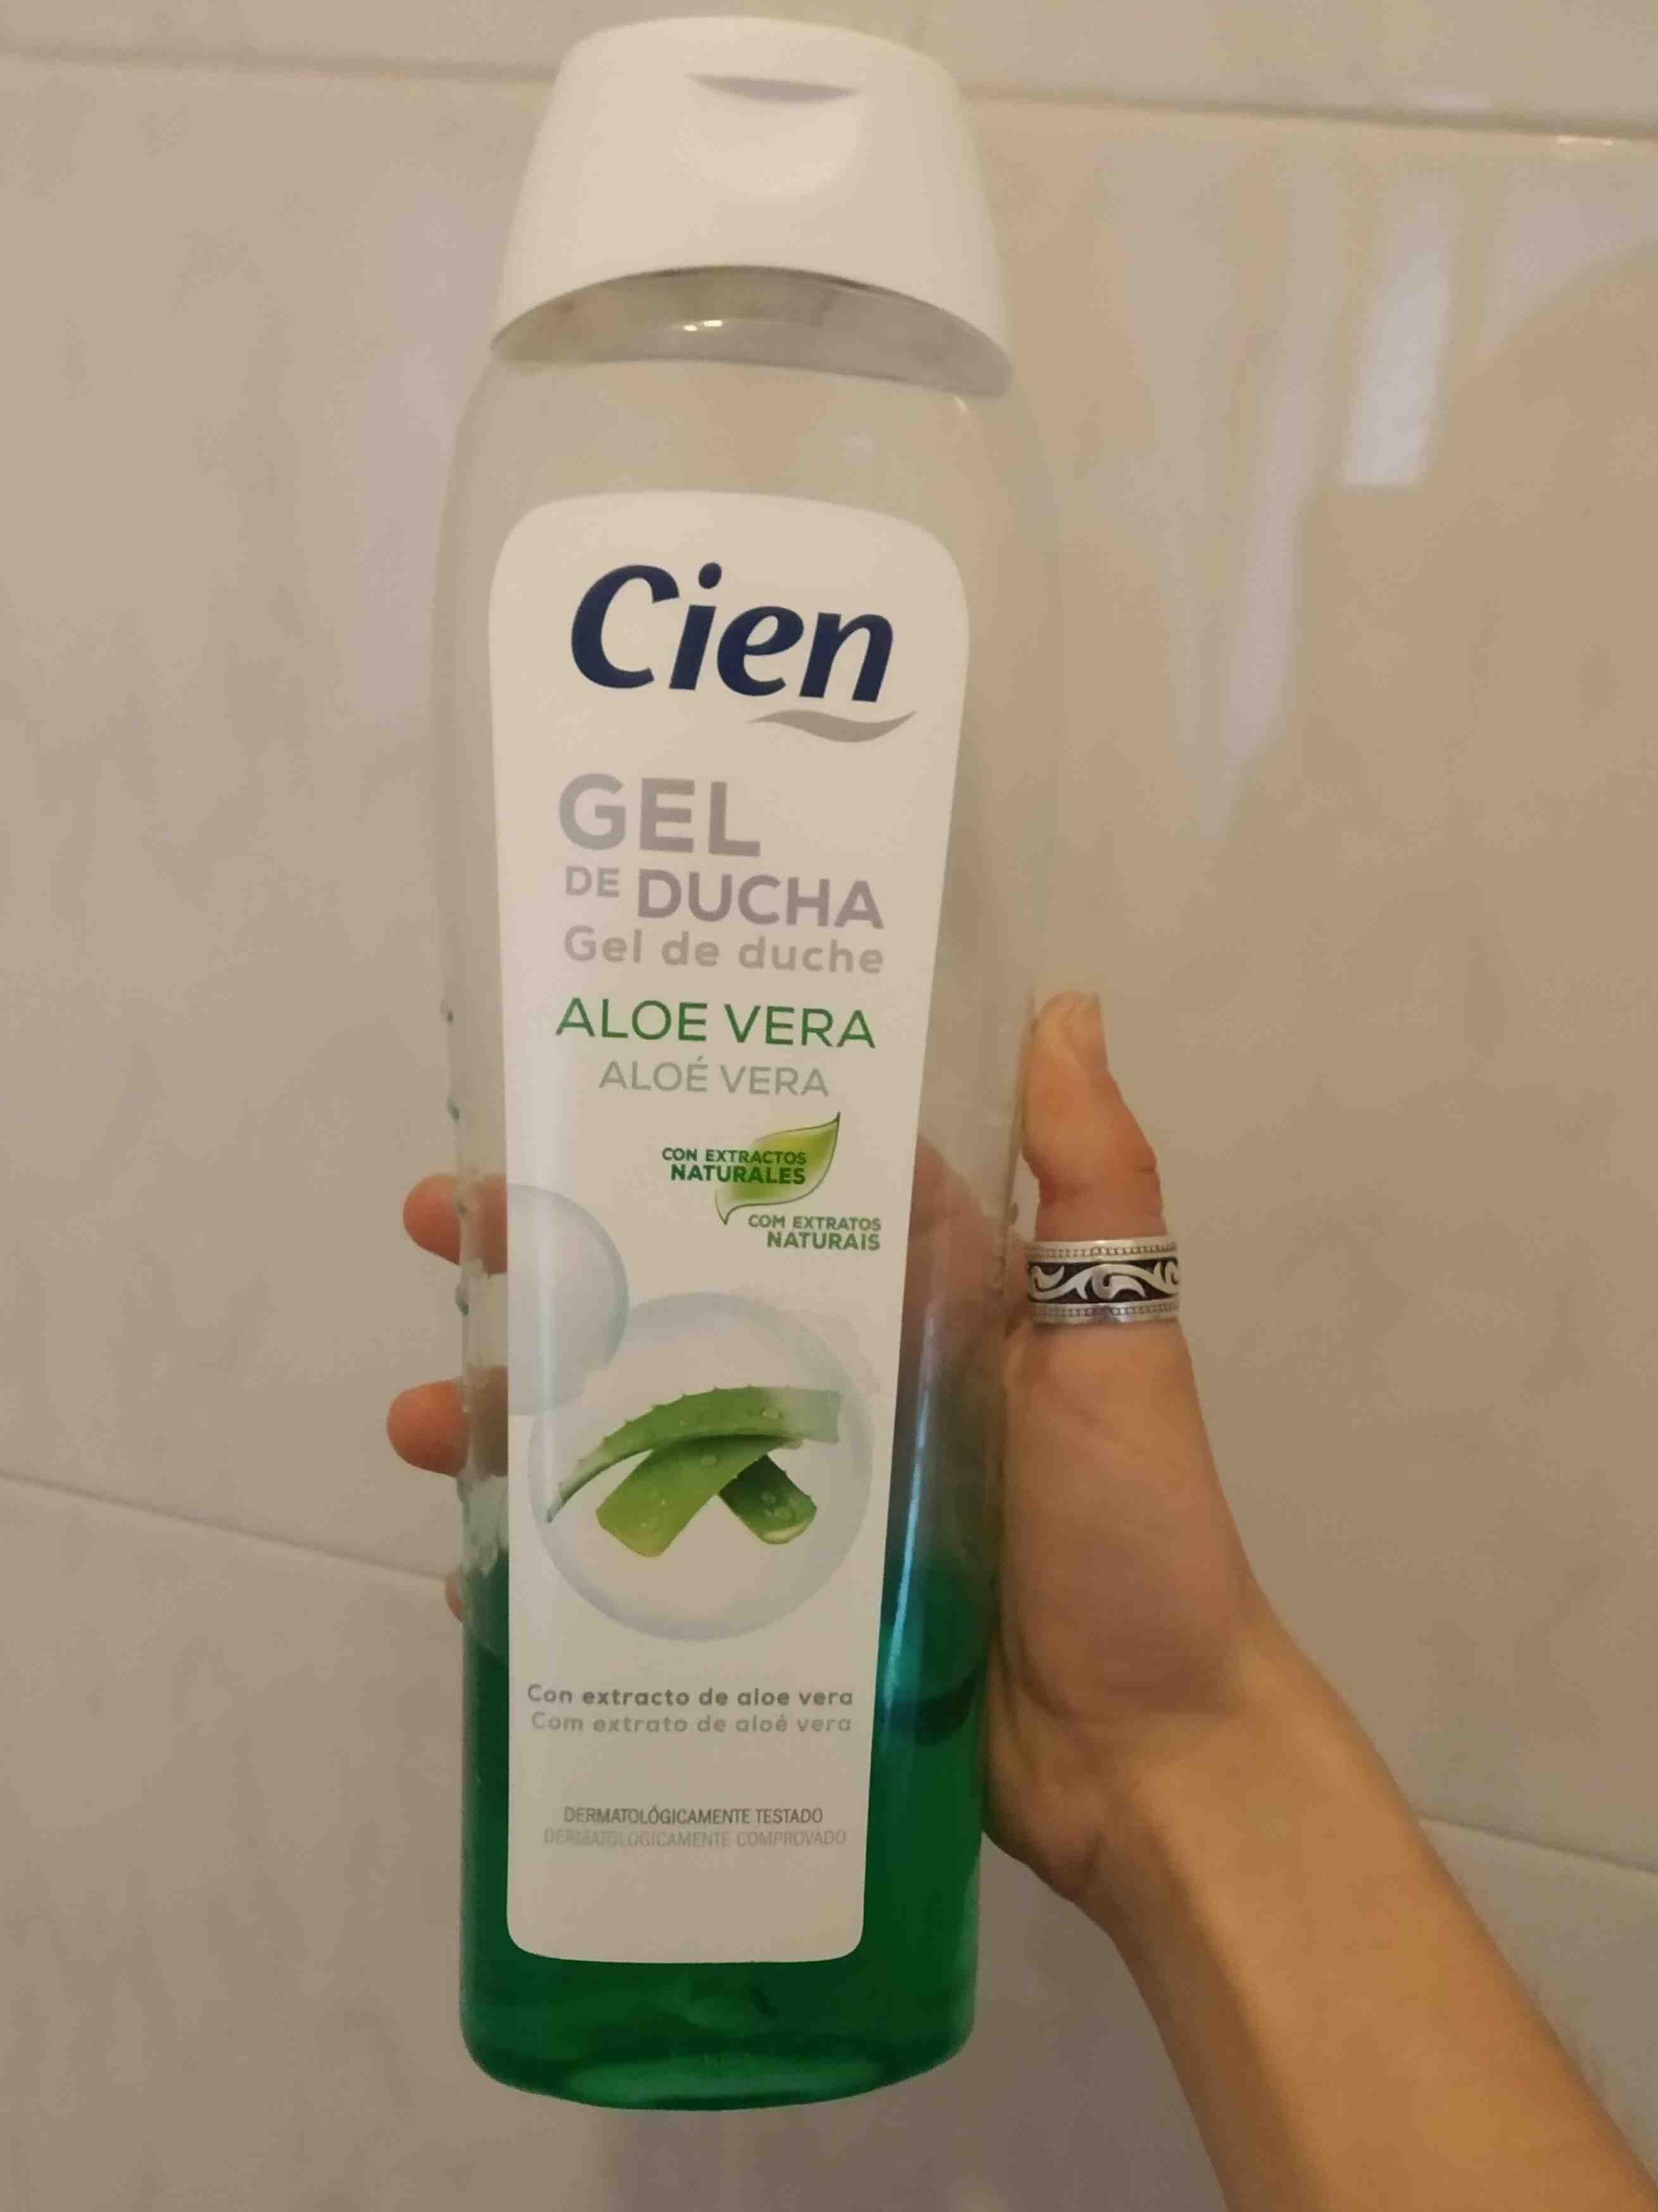 Cien gel de ducha aloe vera - Product - en